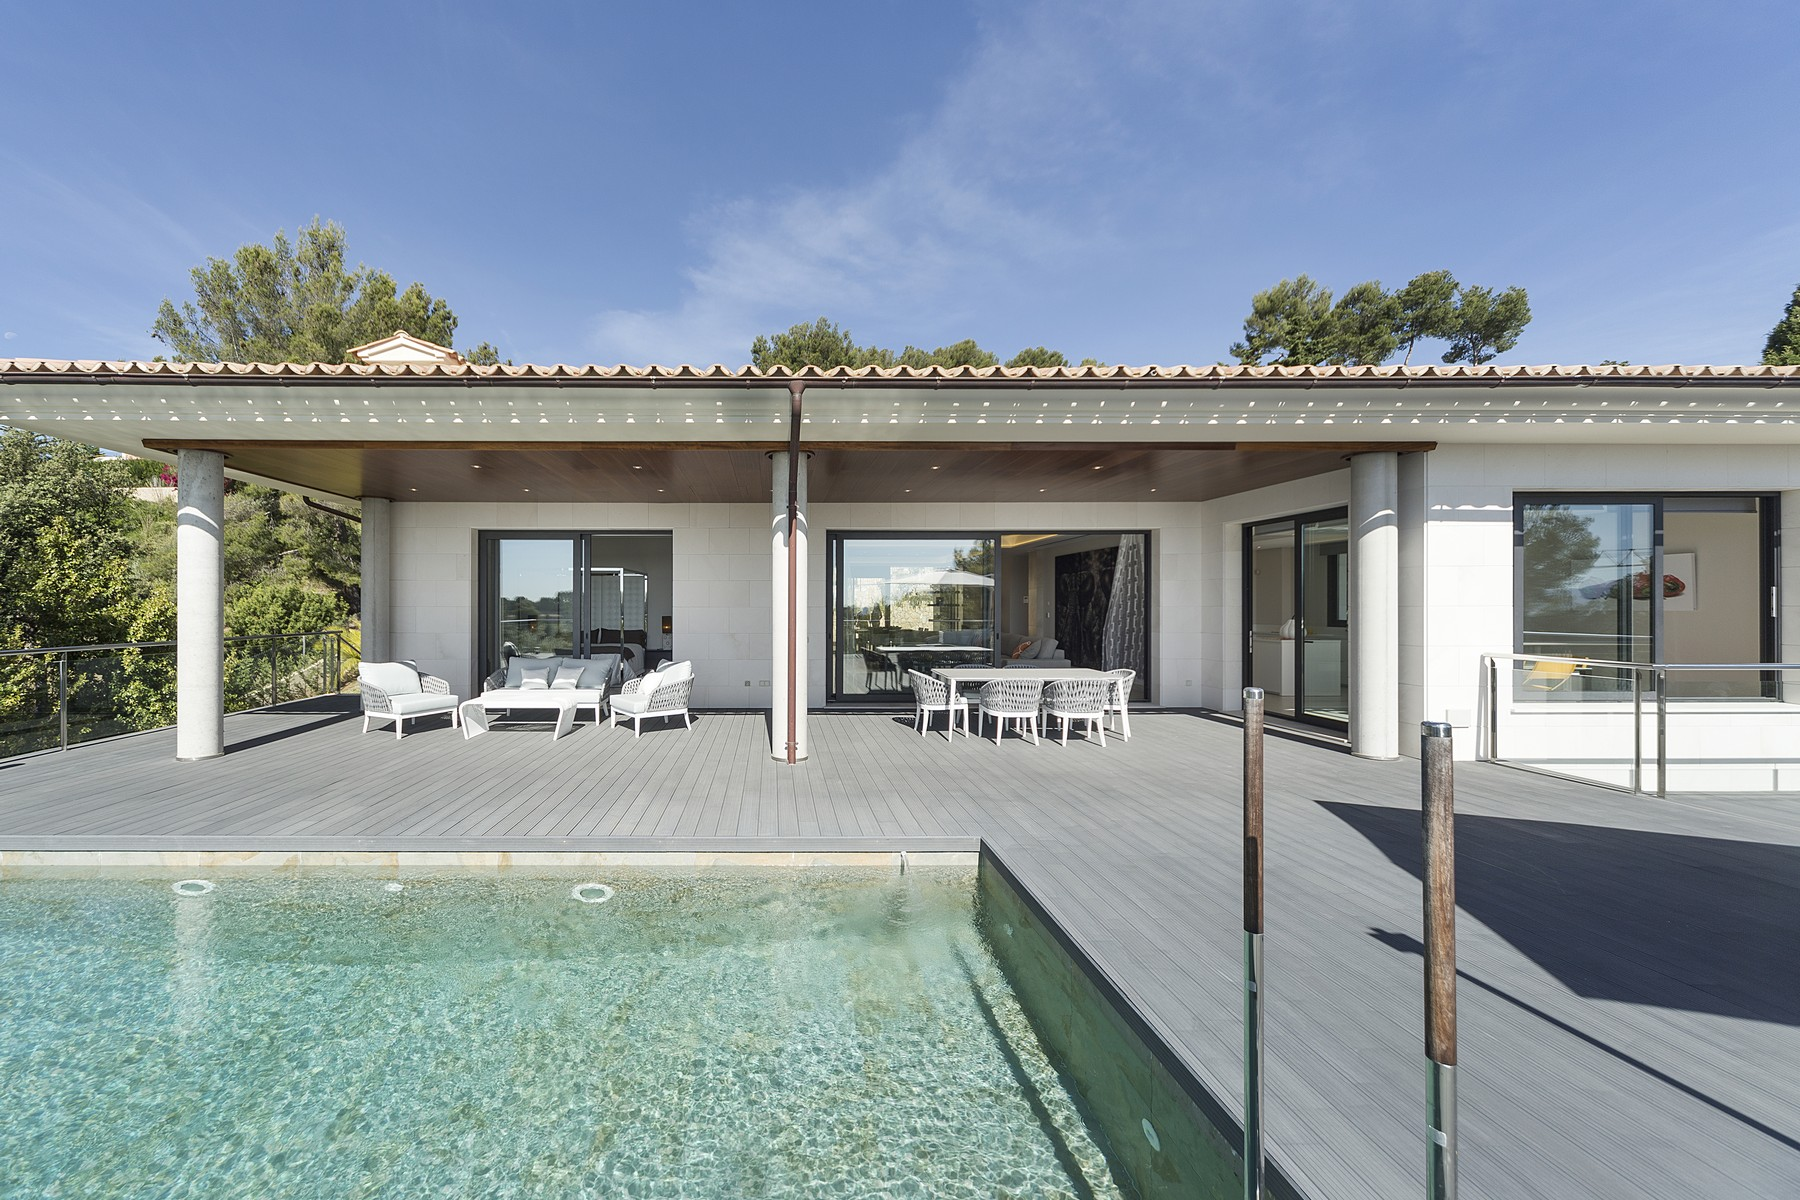 Single Family Home for Sale at Newly-built Villa in Son Vida Palma Center, Mallorca, 07013 Spain